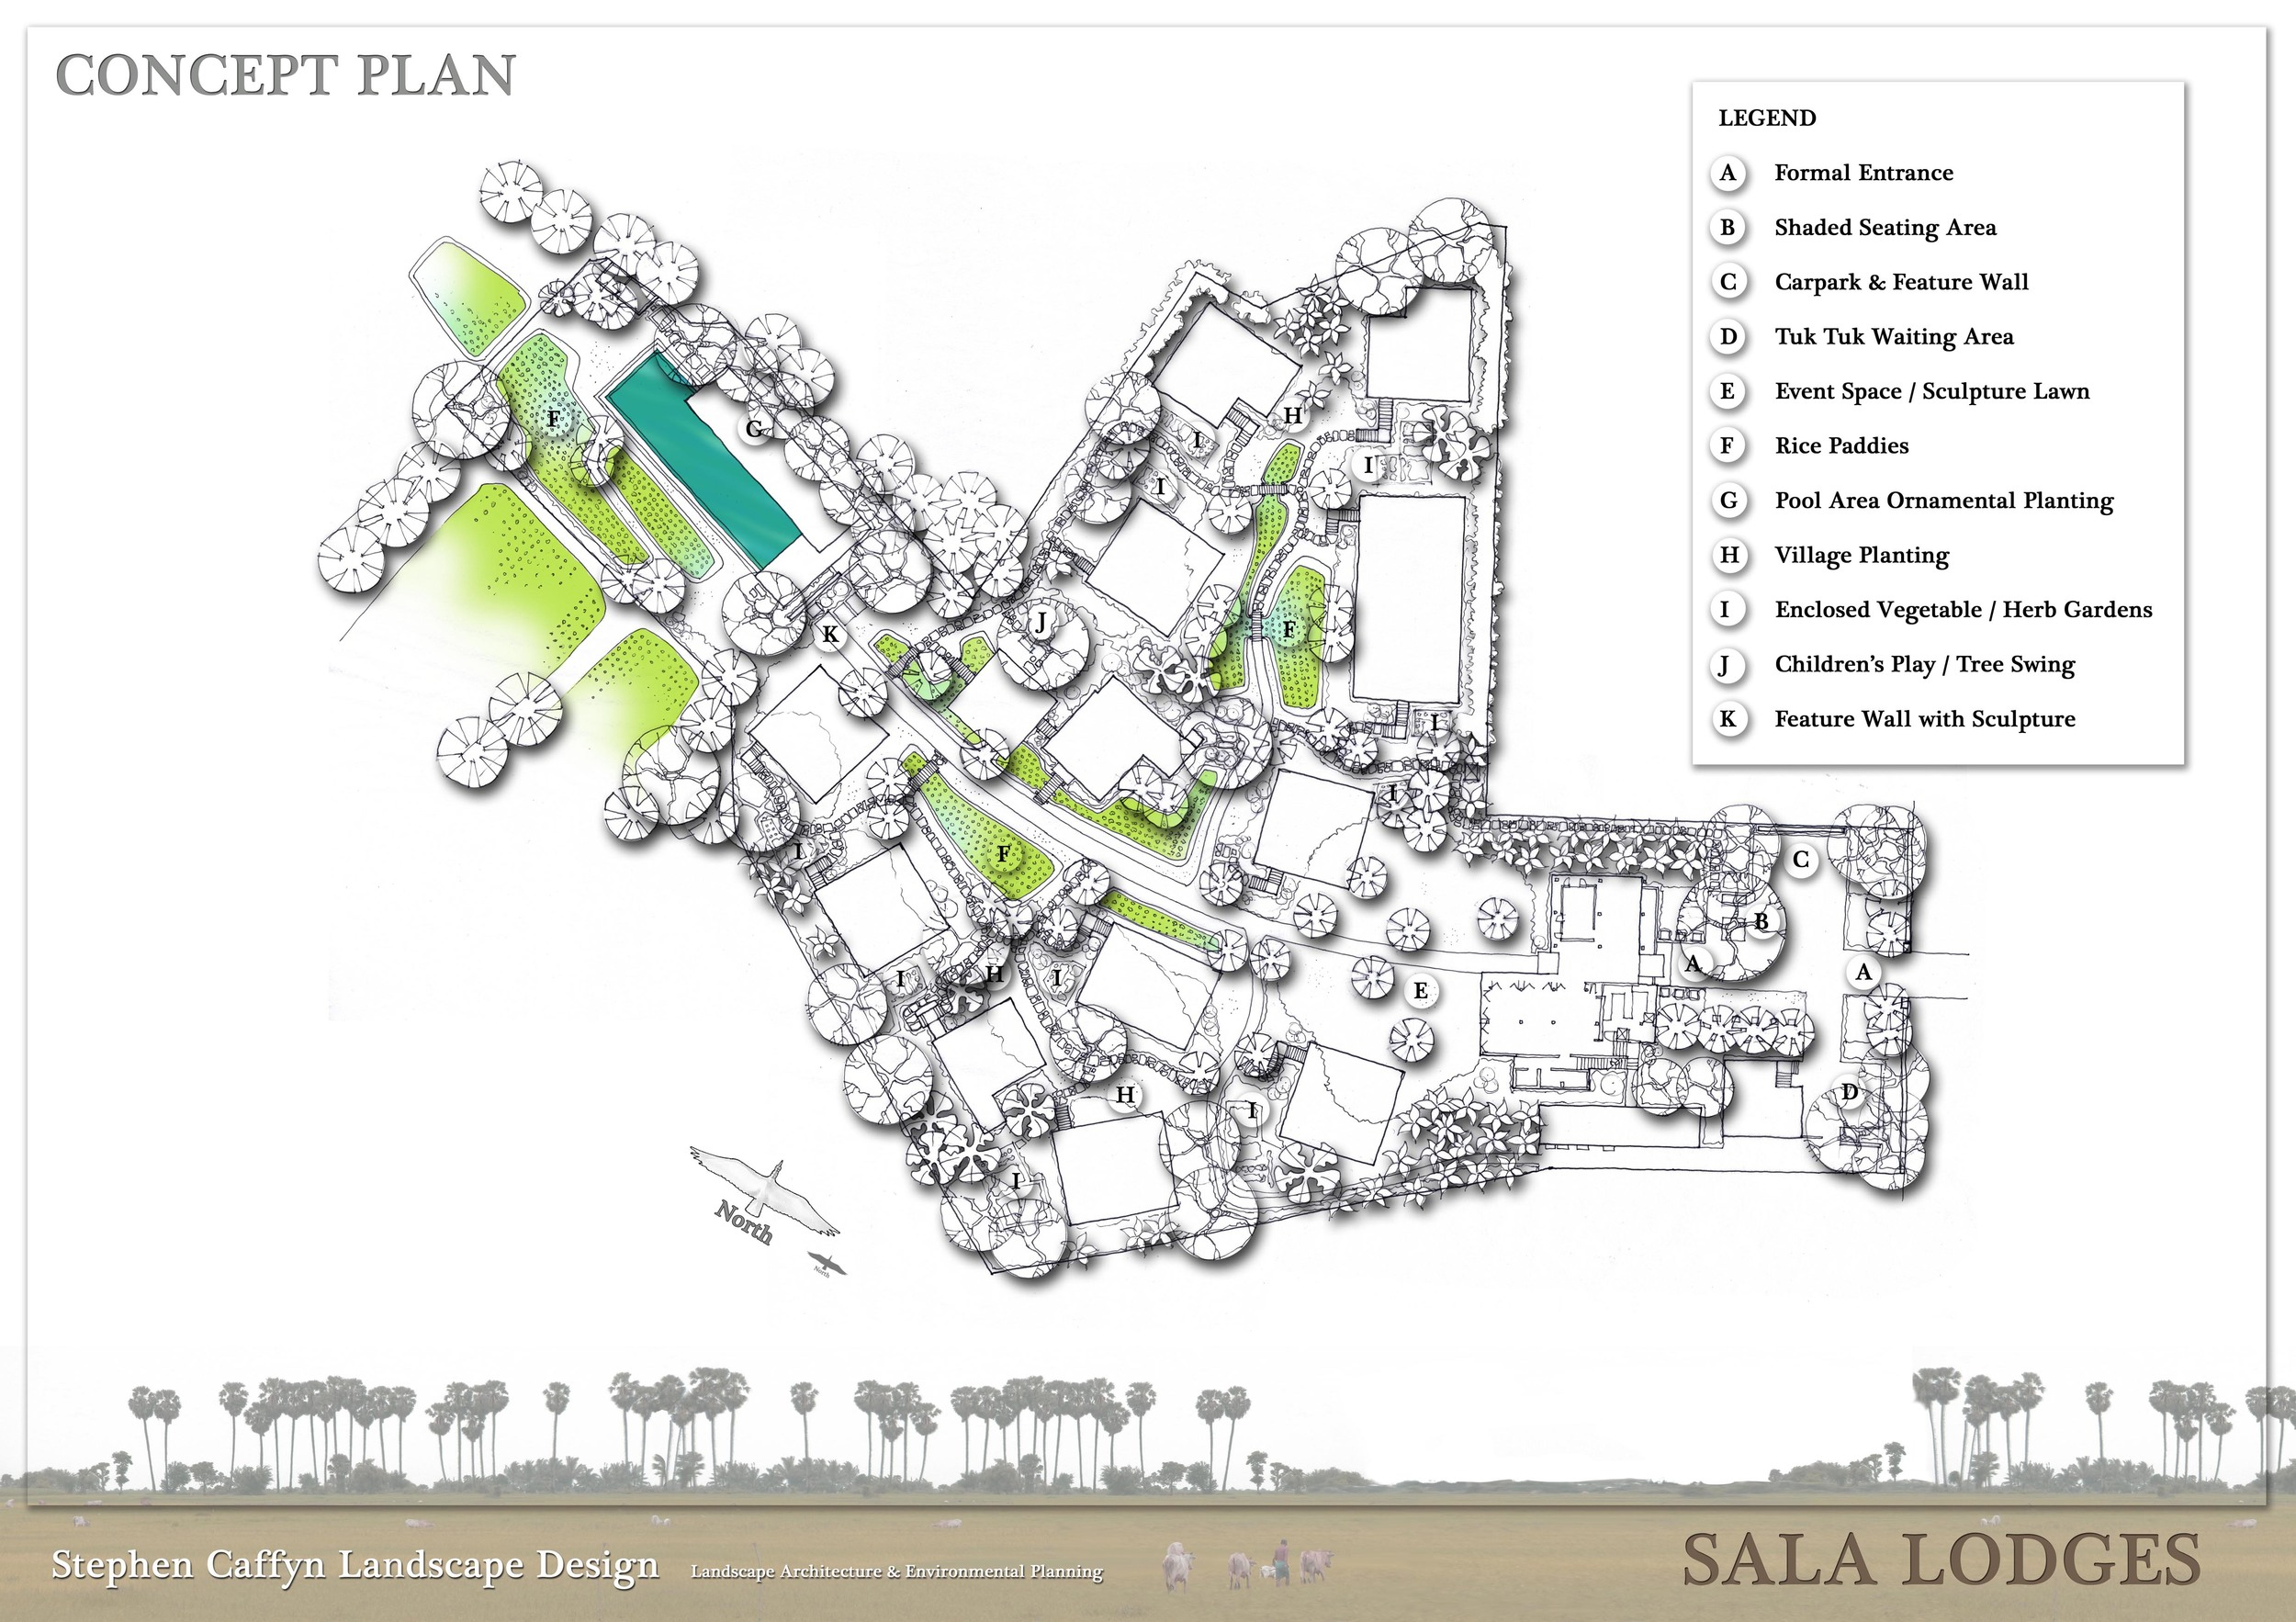 Sala Lodges masterplan